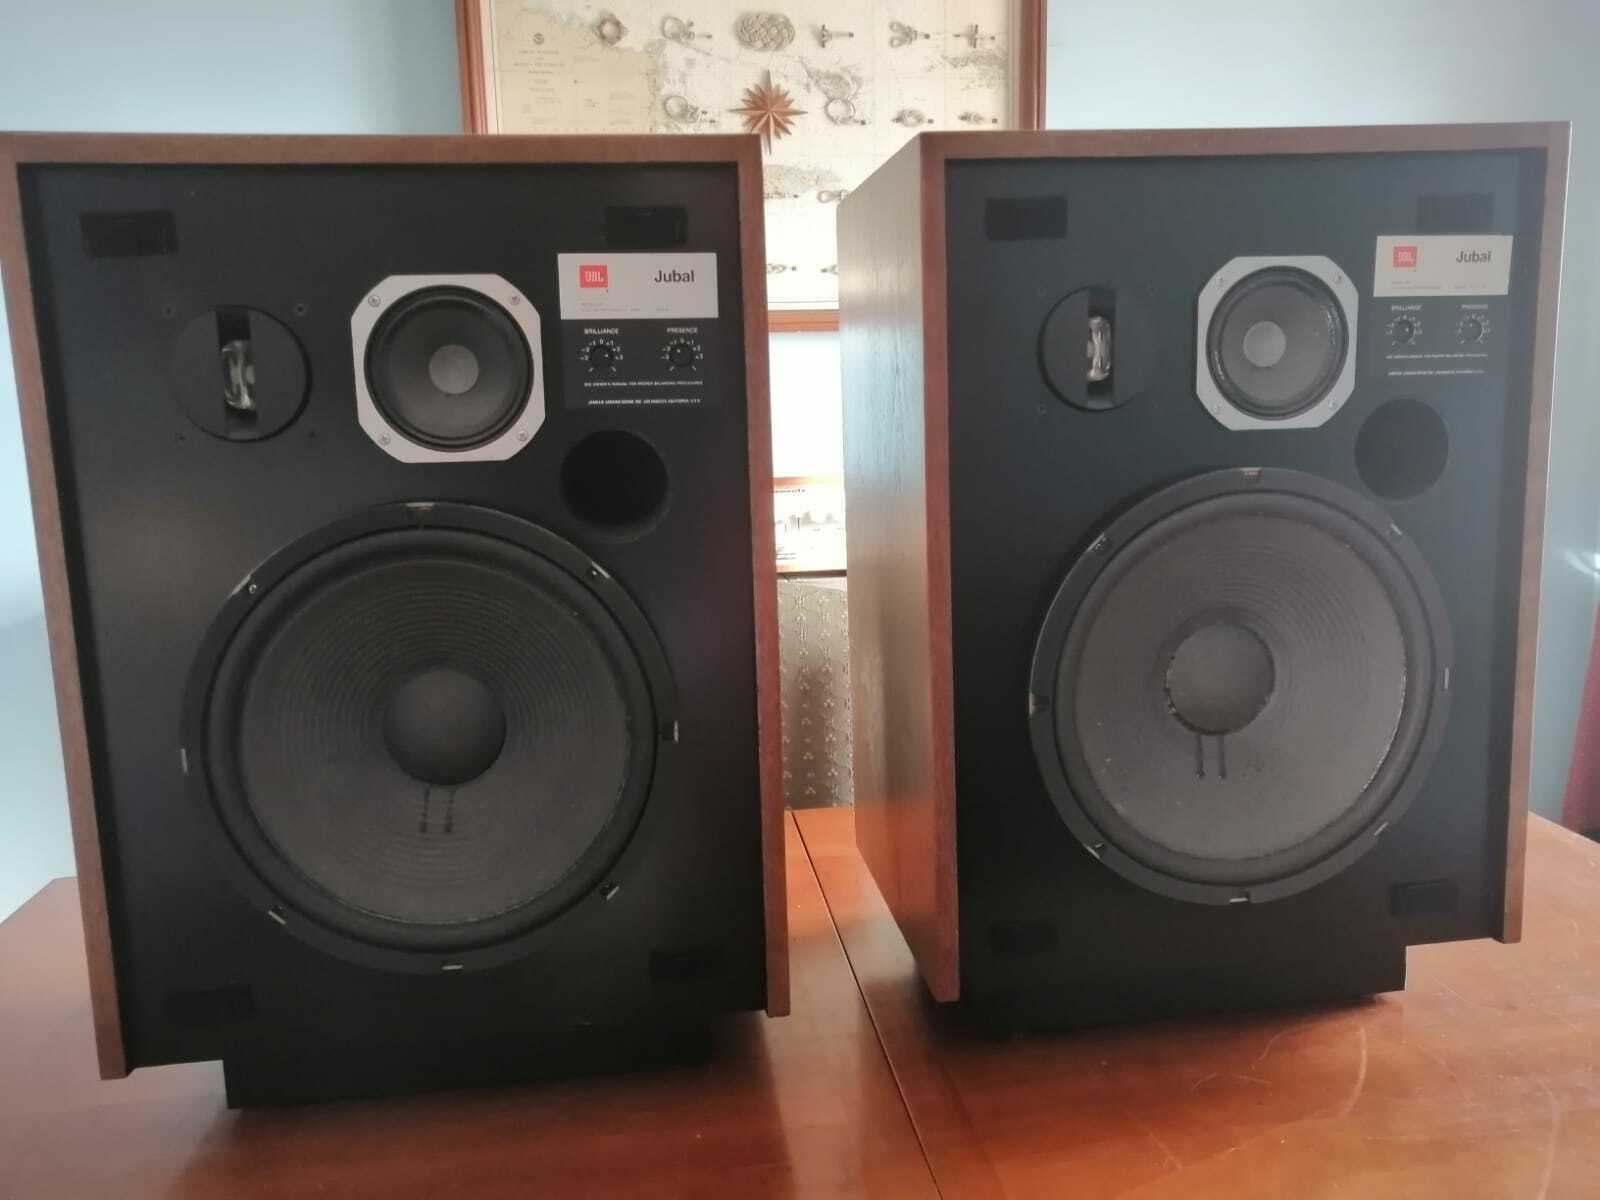 mua loa cũ, JBL L 65 Jubal Free Standing Loudspeaker System